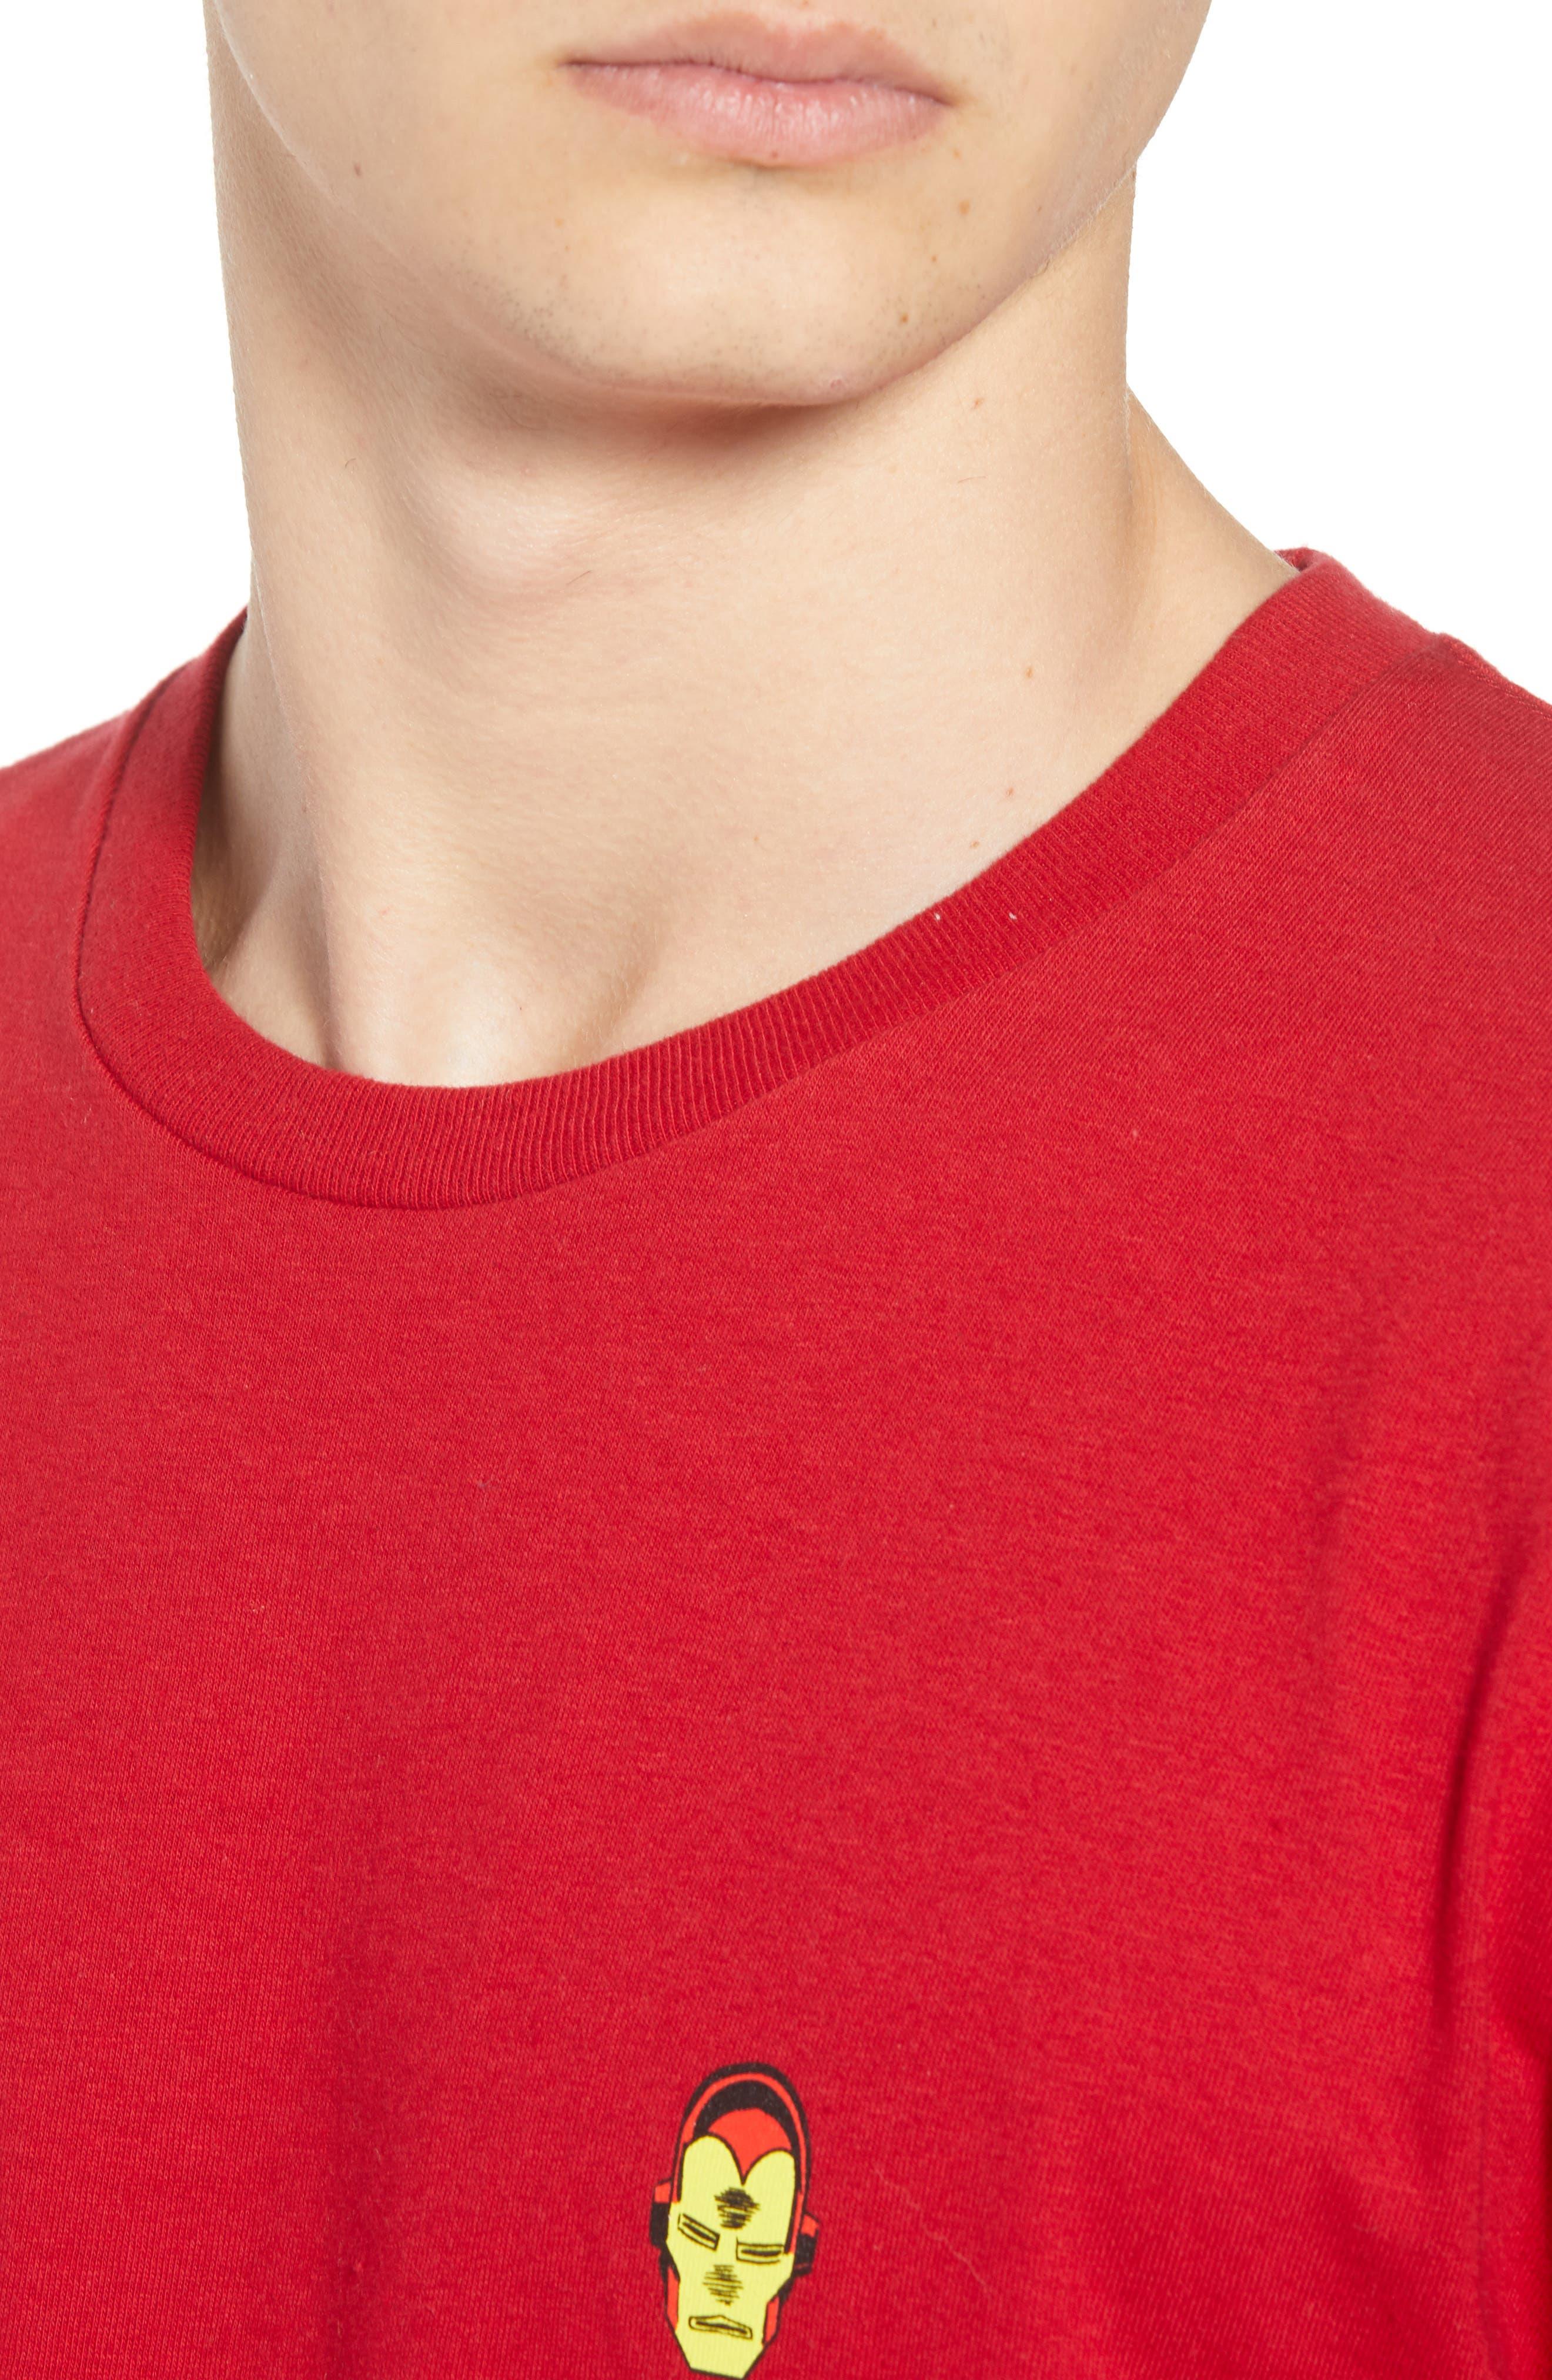 x Marvel<sup>®</sup> Iron Man T-Shirt,                             Alternate thumbnail 4, color,                             601